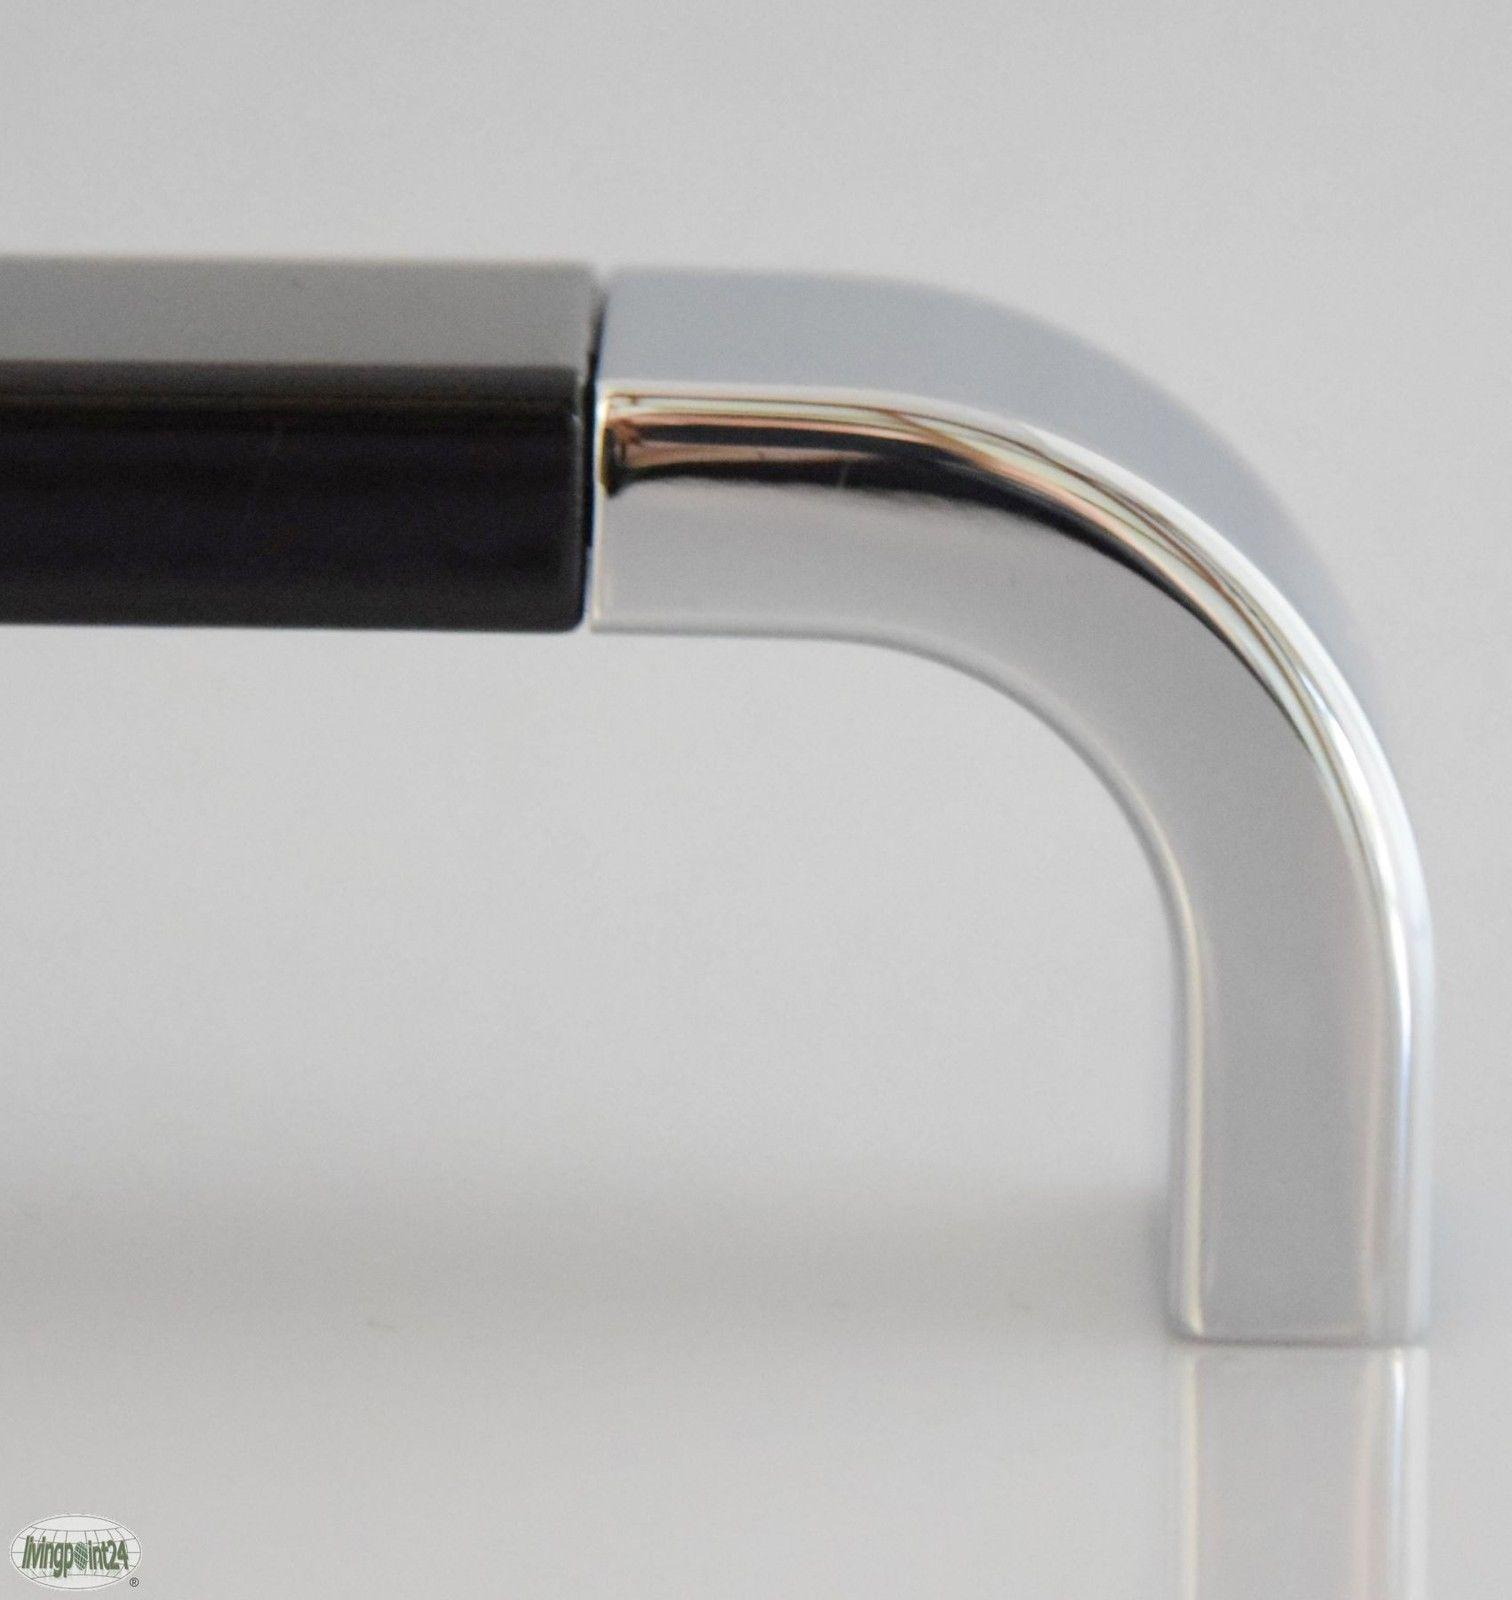 Möbelgriff BA 128 160 192mm verchromt Küchen Kommoden